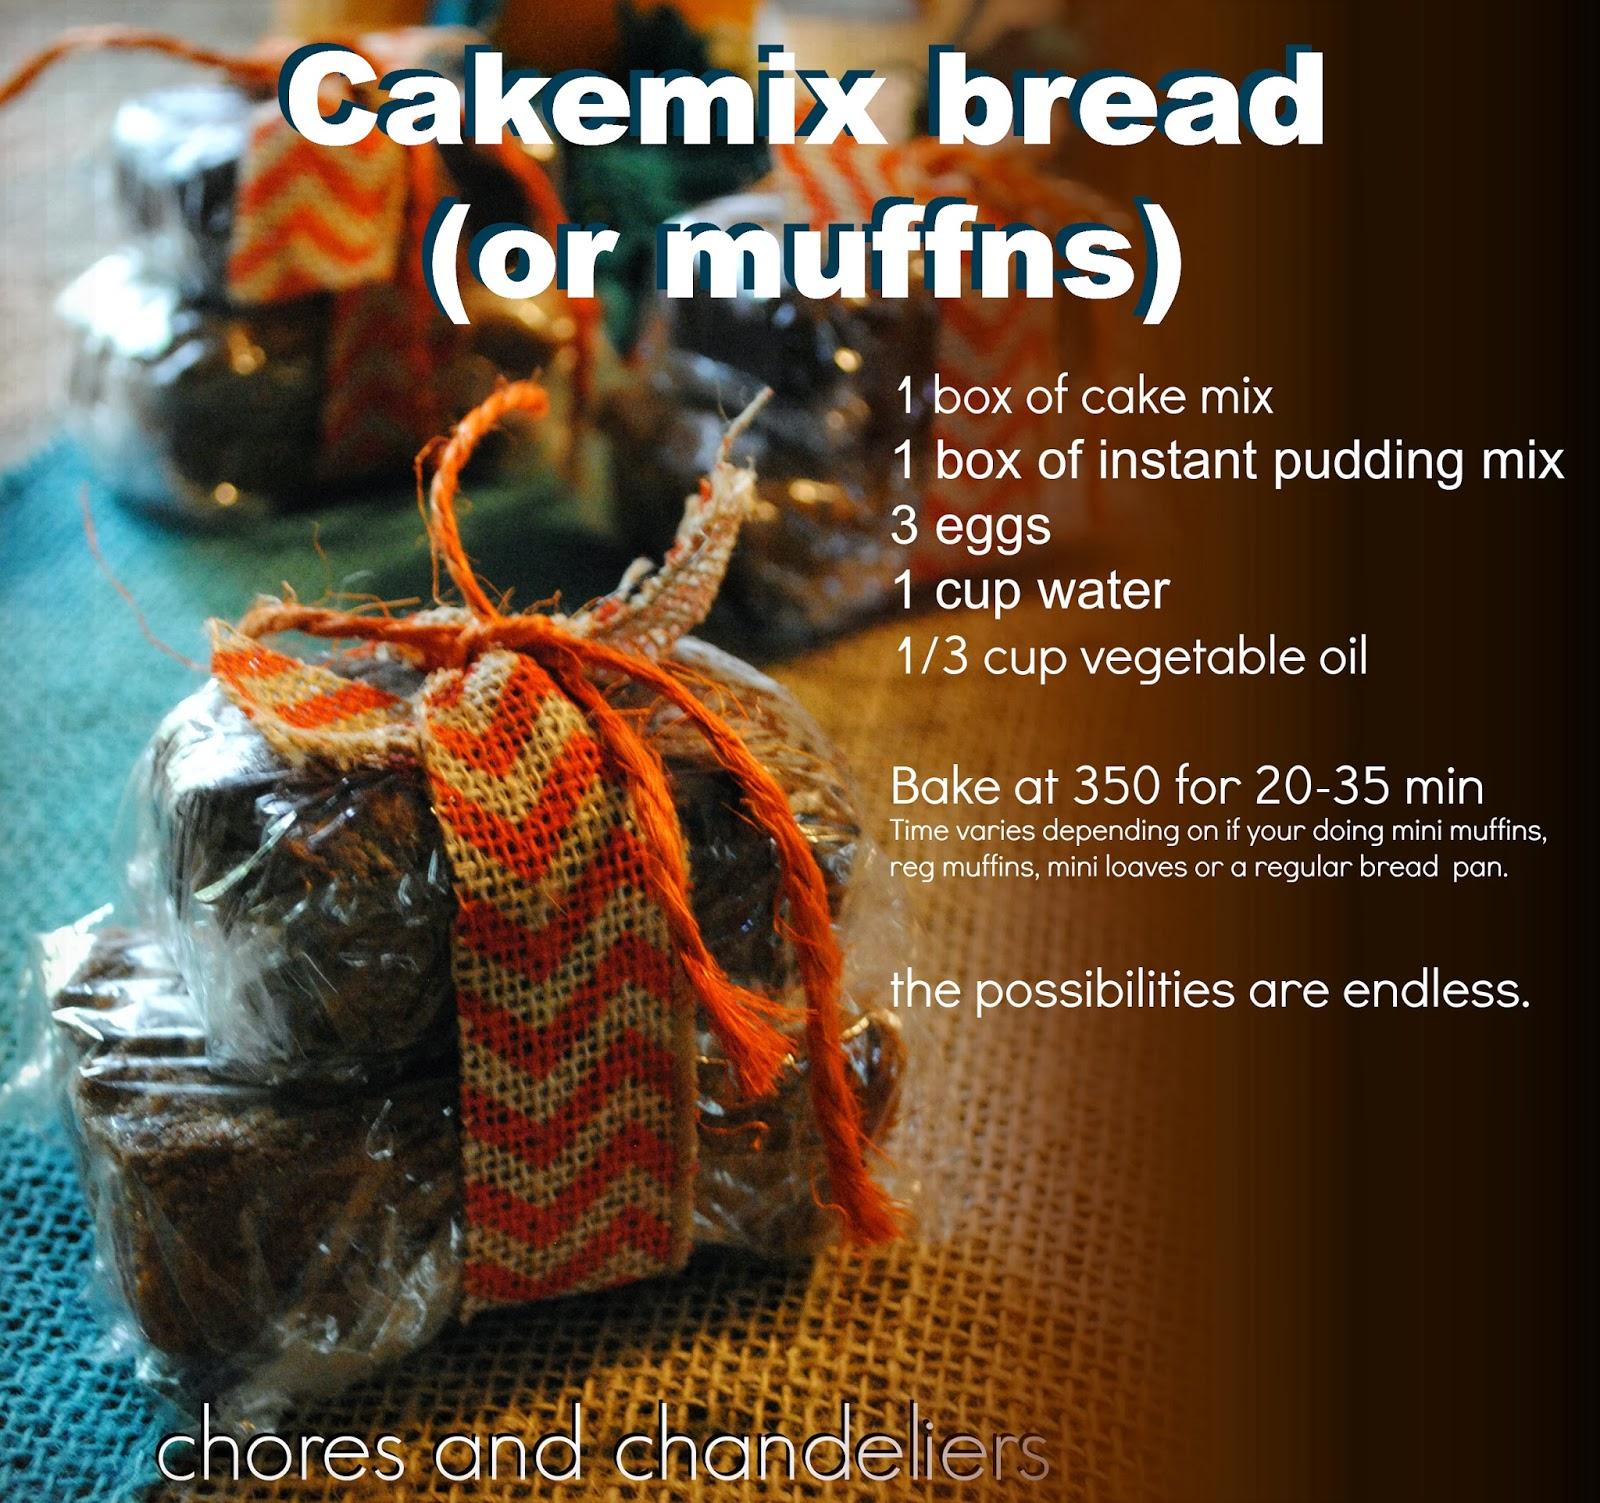 http://choresandchandeliers.blogspot.com/2013/10/cake-mix-bread-recipe-suzi-homefaker.html